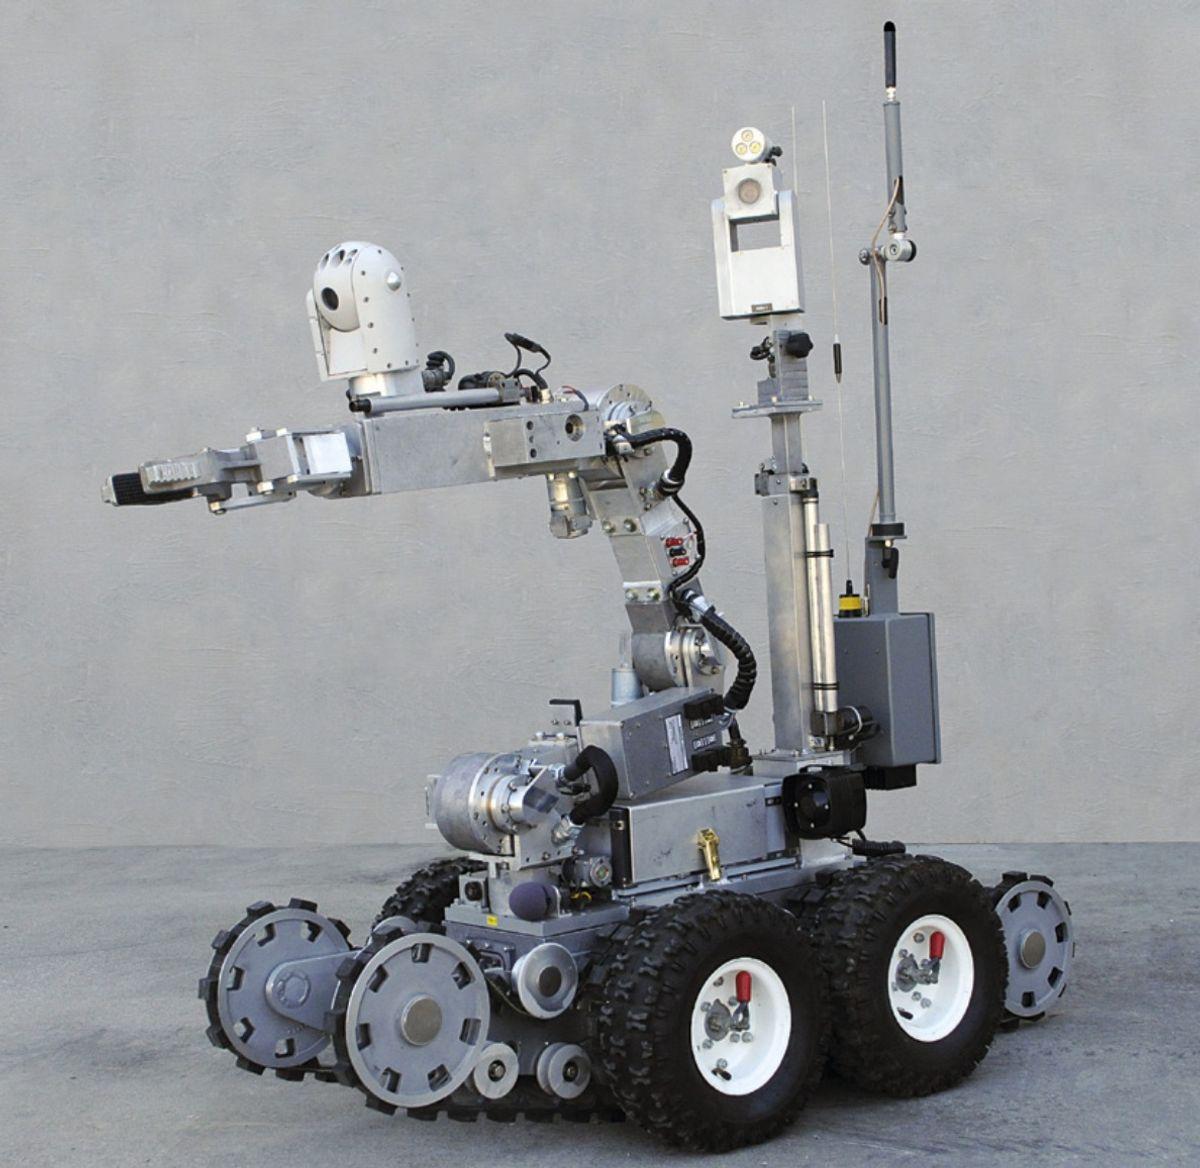 Northrop Grumman Remotec Andros F6B robot